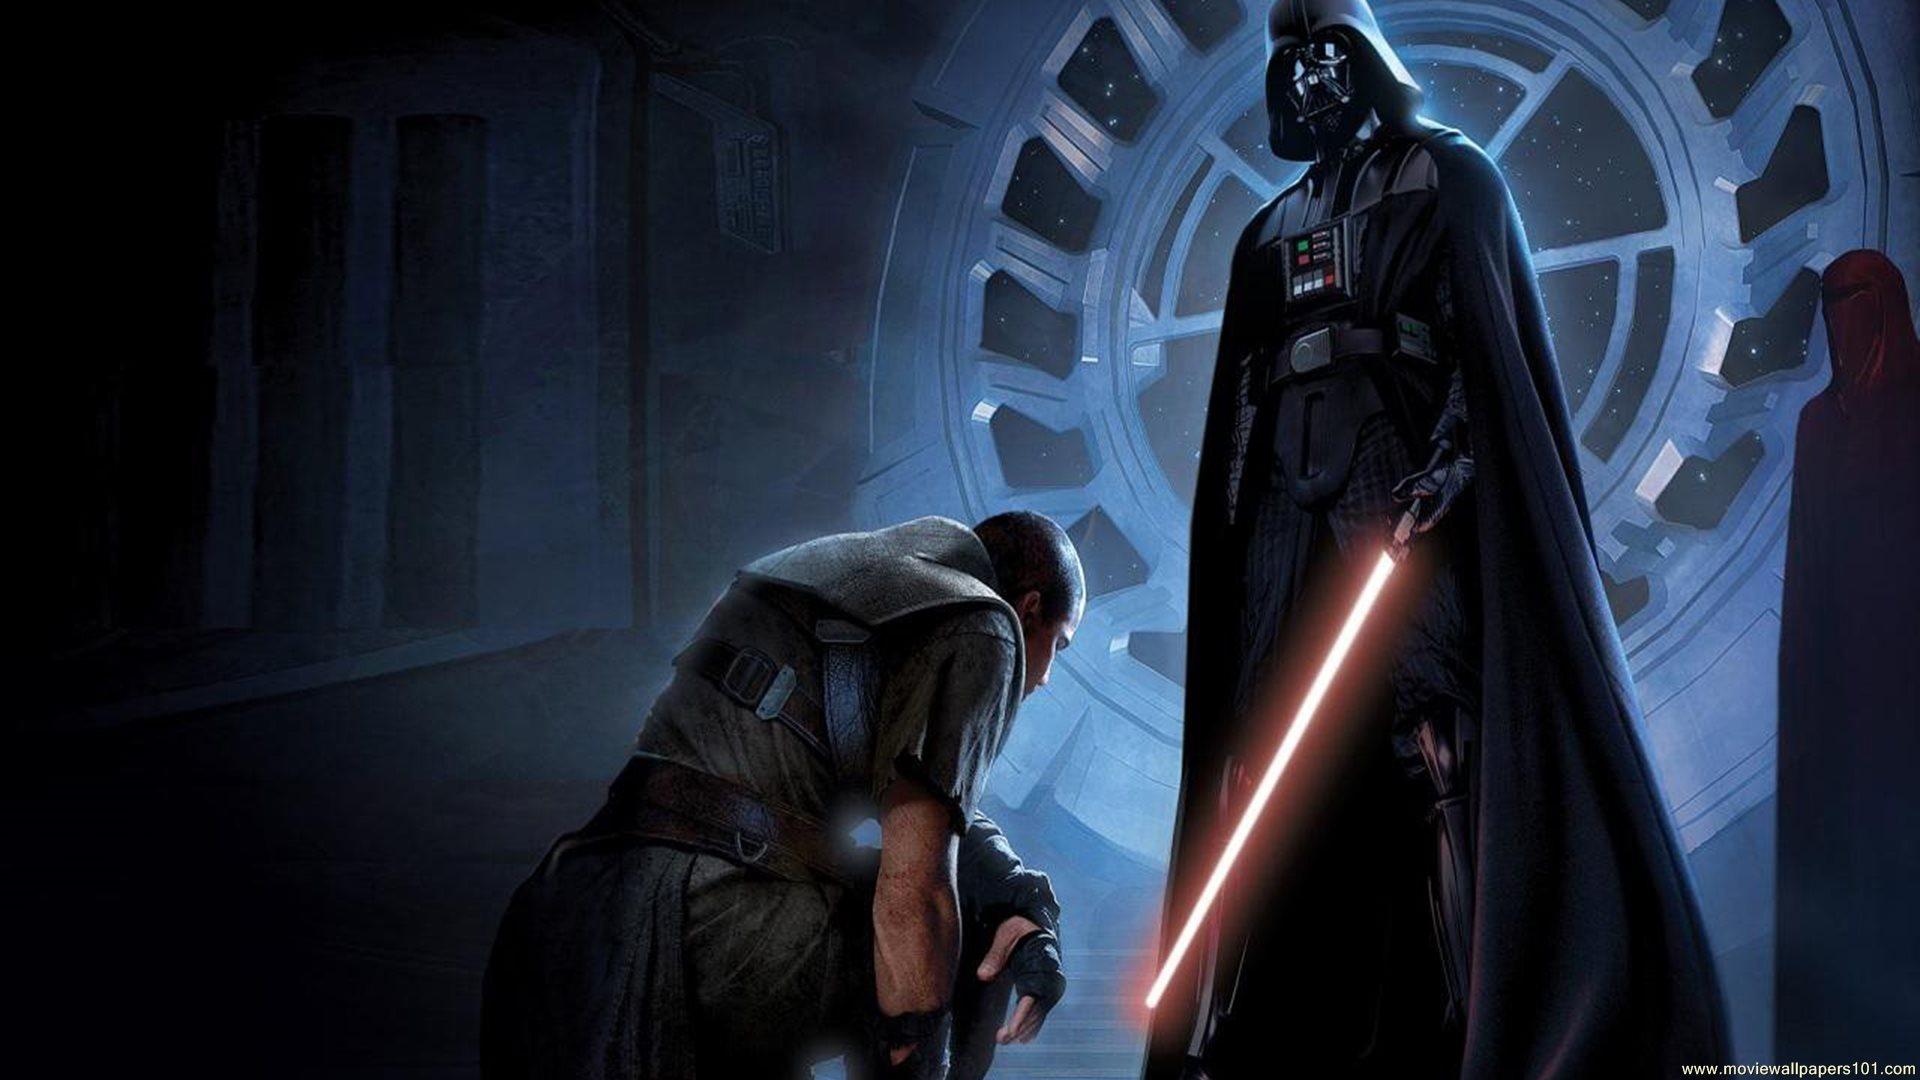 Download Star Wars VII Force Awakens 2015 Movie HD Wallpaper Search 1920x1080